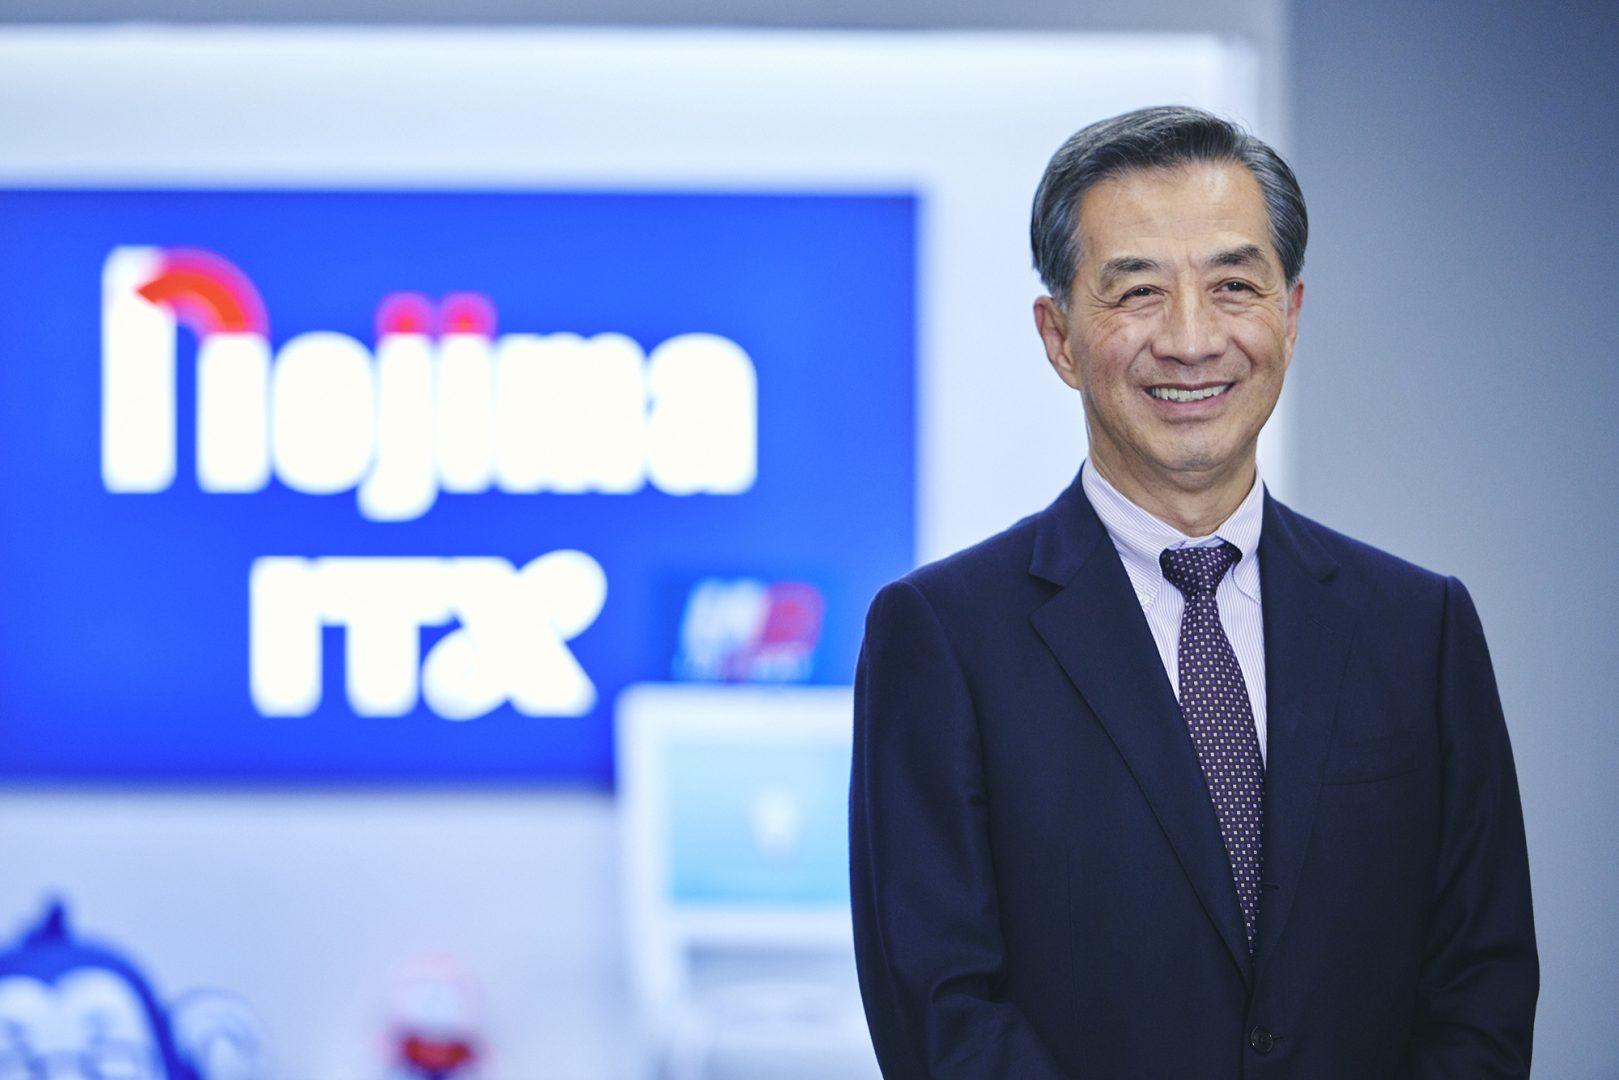 Tのオフィシャルパートナー、ノジマ社長が物申す「Tの9つの改善点」【インタビュー前編】